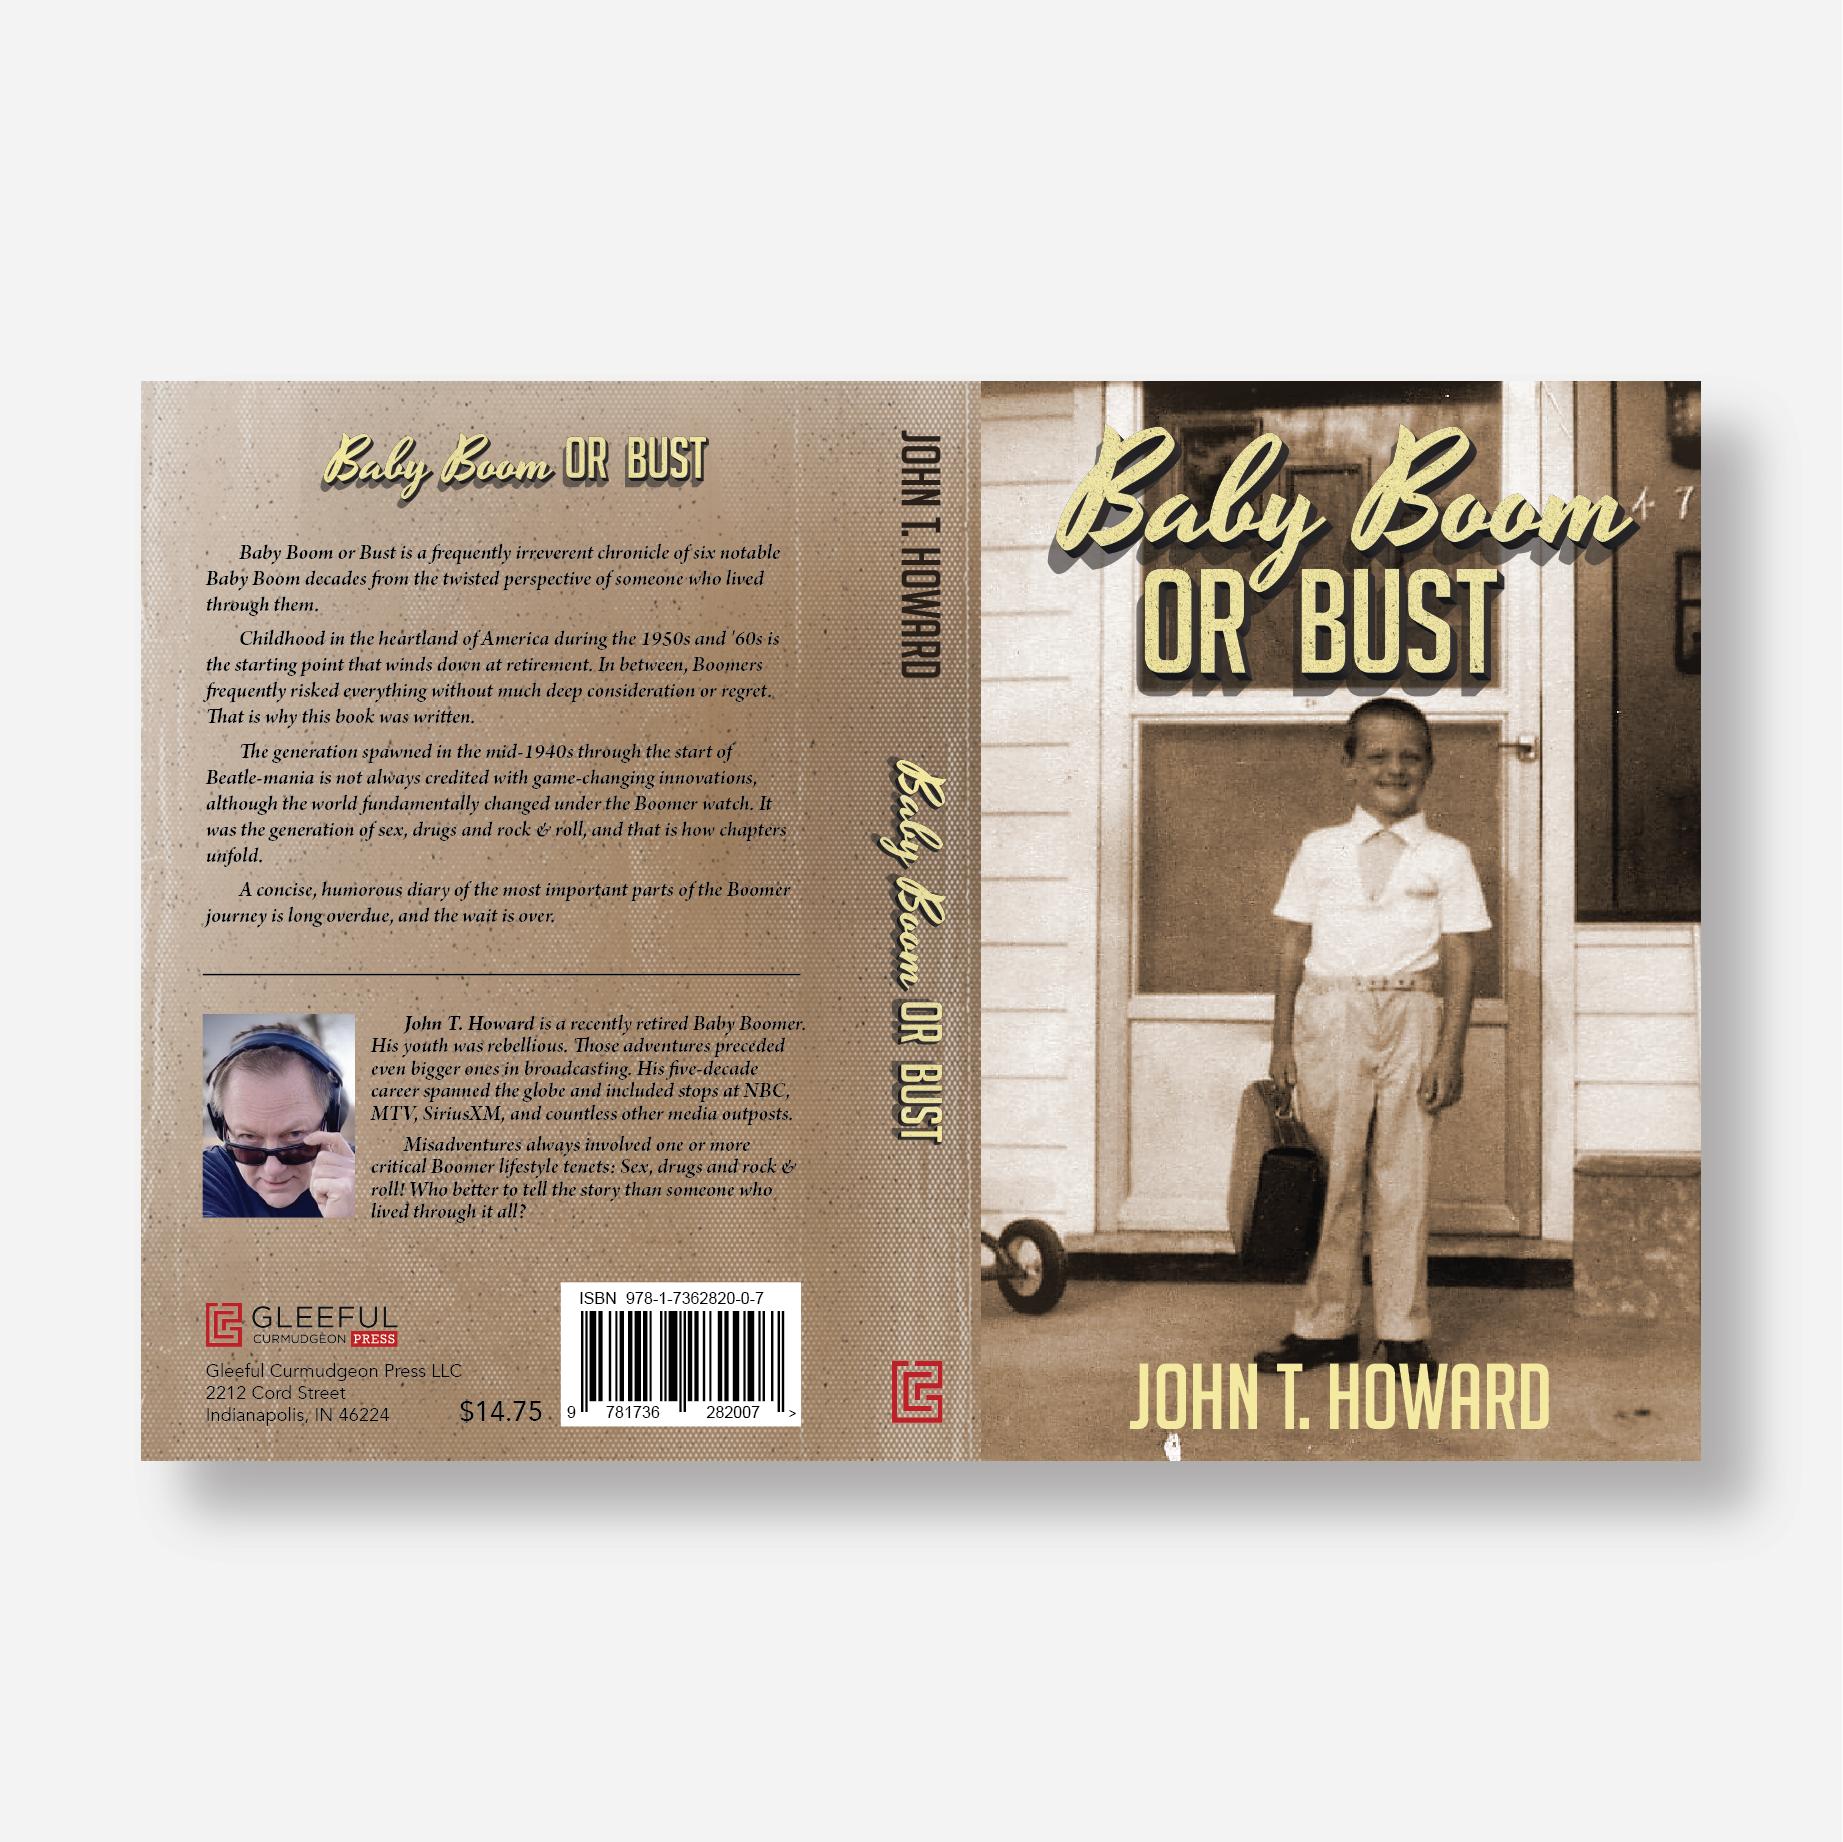 BBOB John T Howard